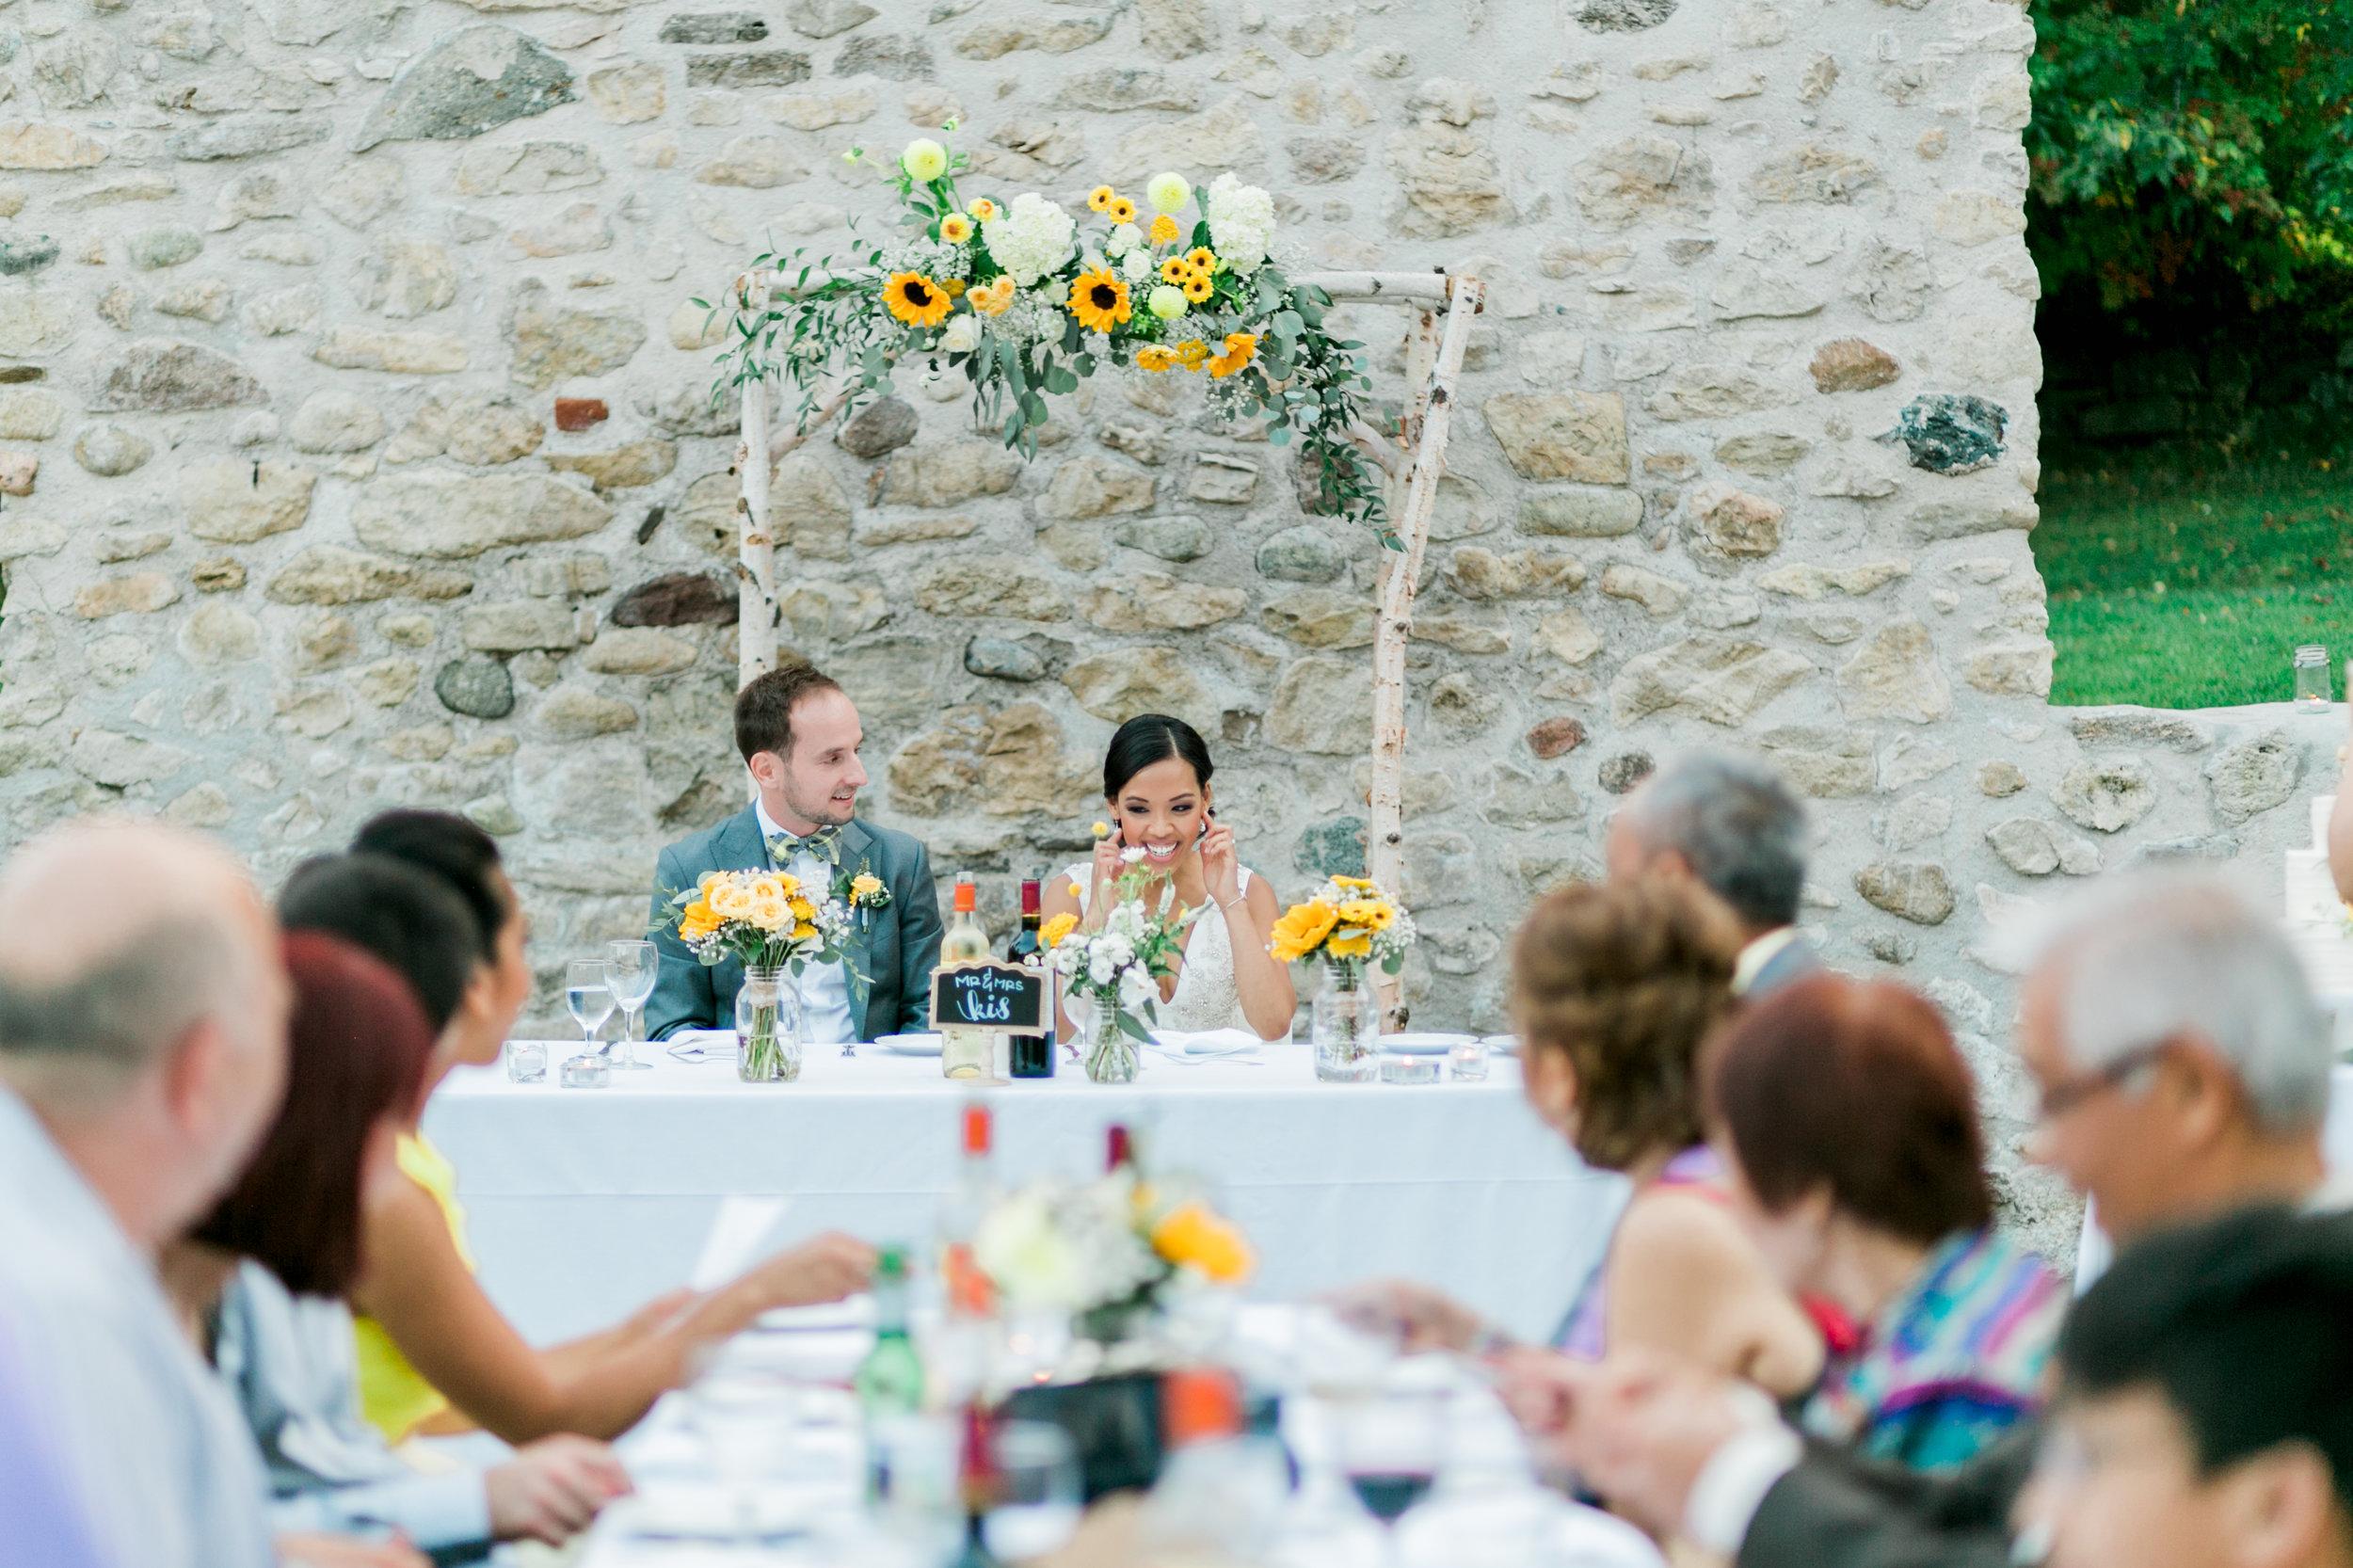 Alton Mills Wedding - Reception-54.jpg